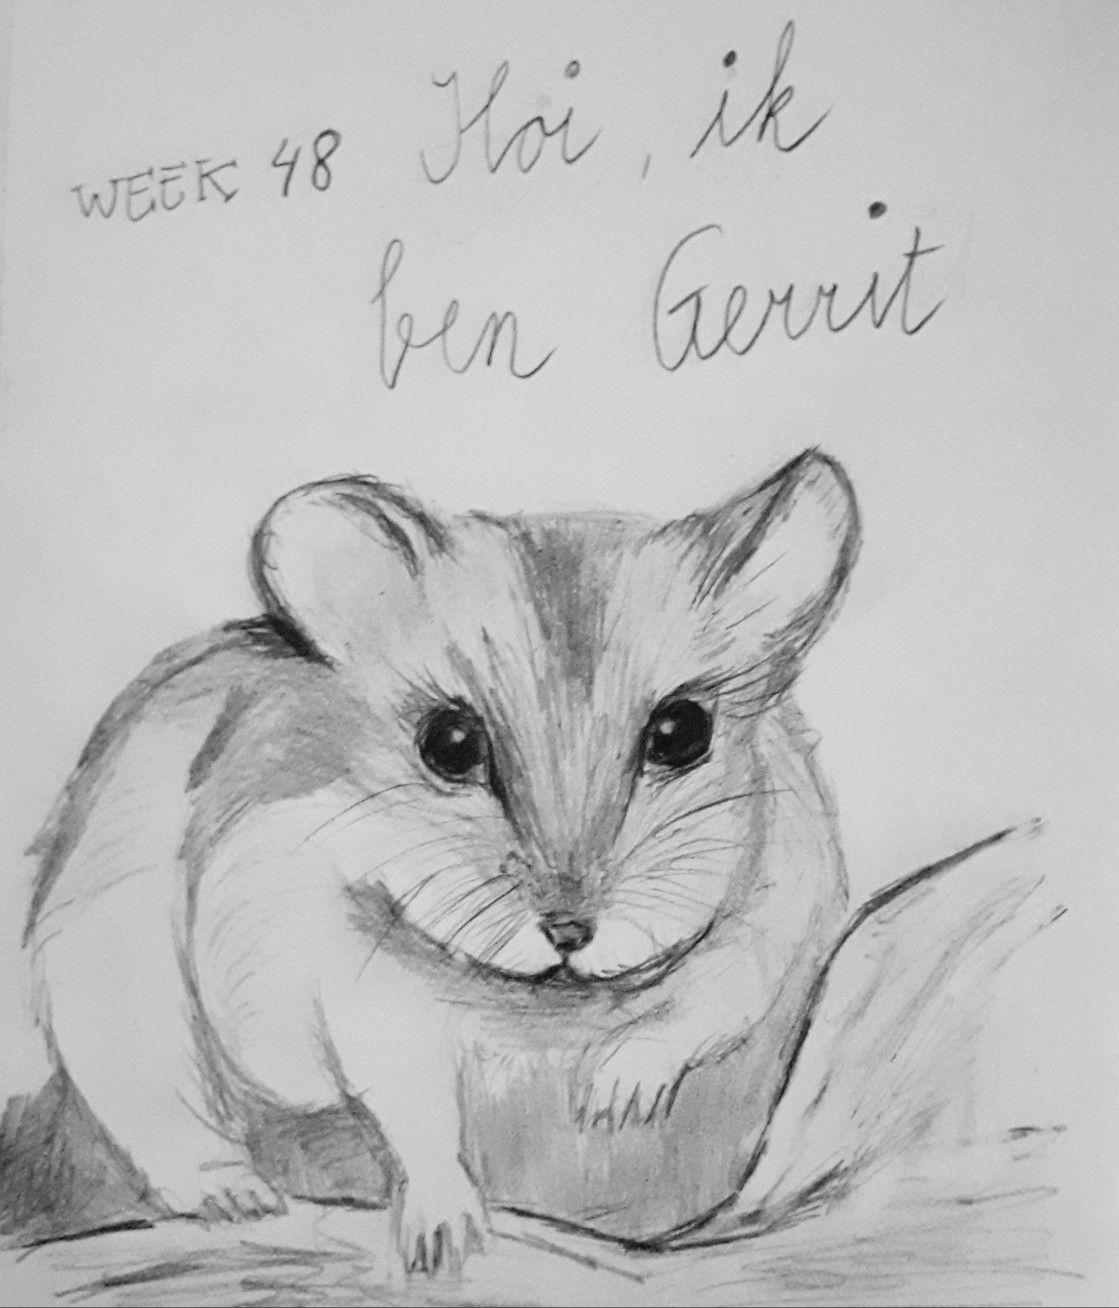 Week 48 Ik Ben Gerrit Potloodtekening Drawing Hamster Potloodtekeningen Dingen Om Te Tekenen Drawing